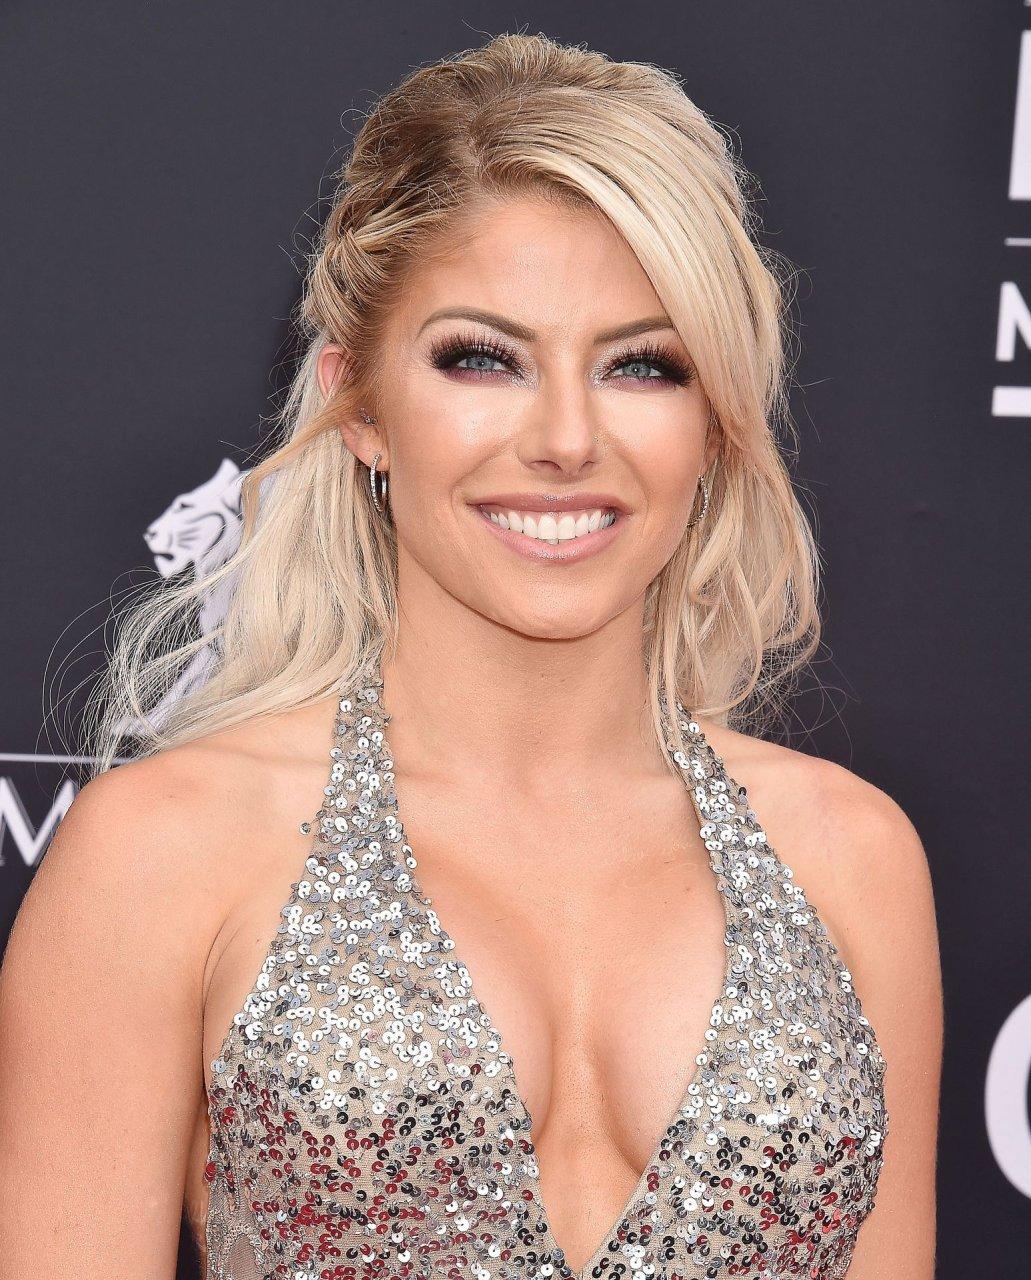 Alexa Bliss Porn alexa bliss nude photos | #thefappening